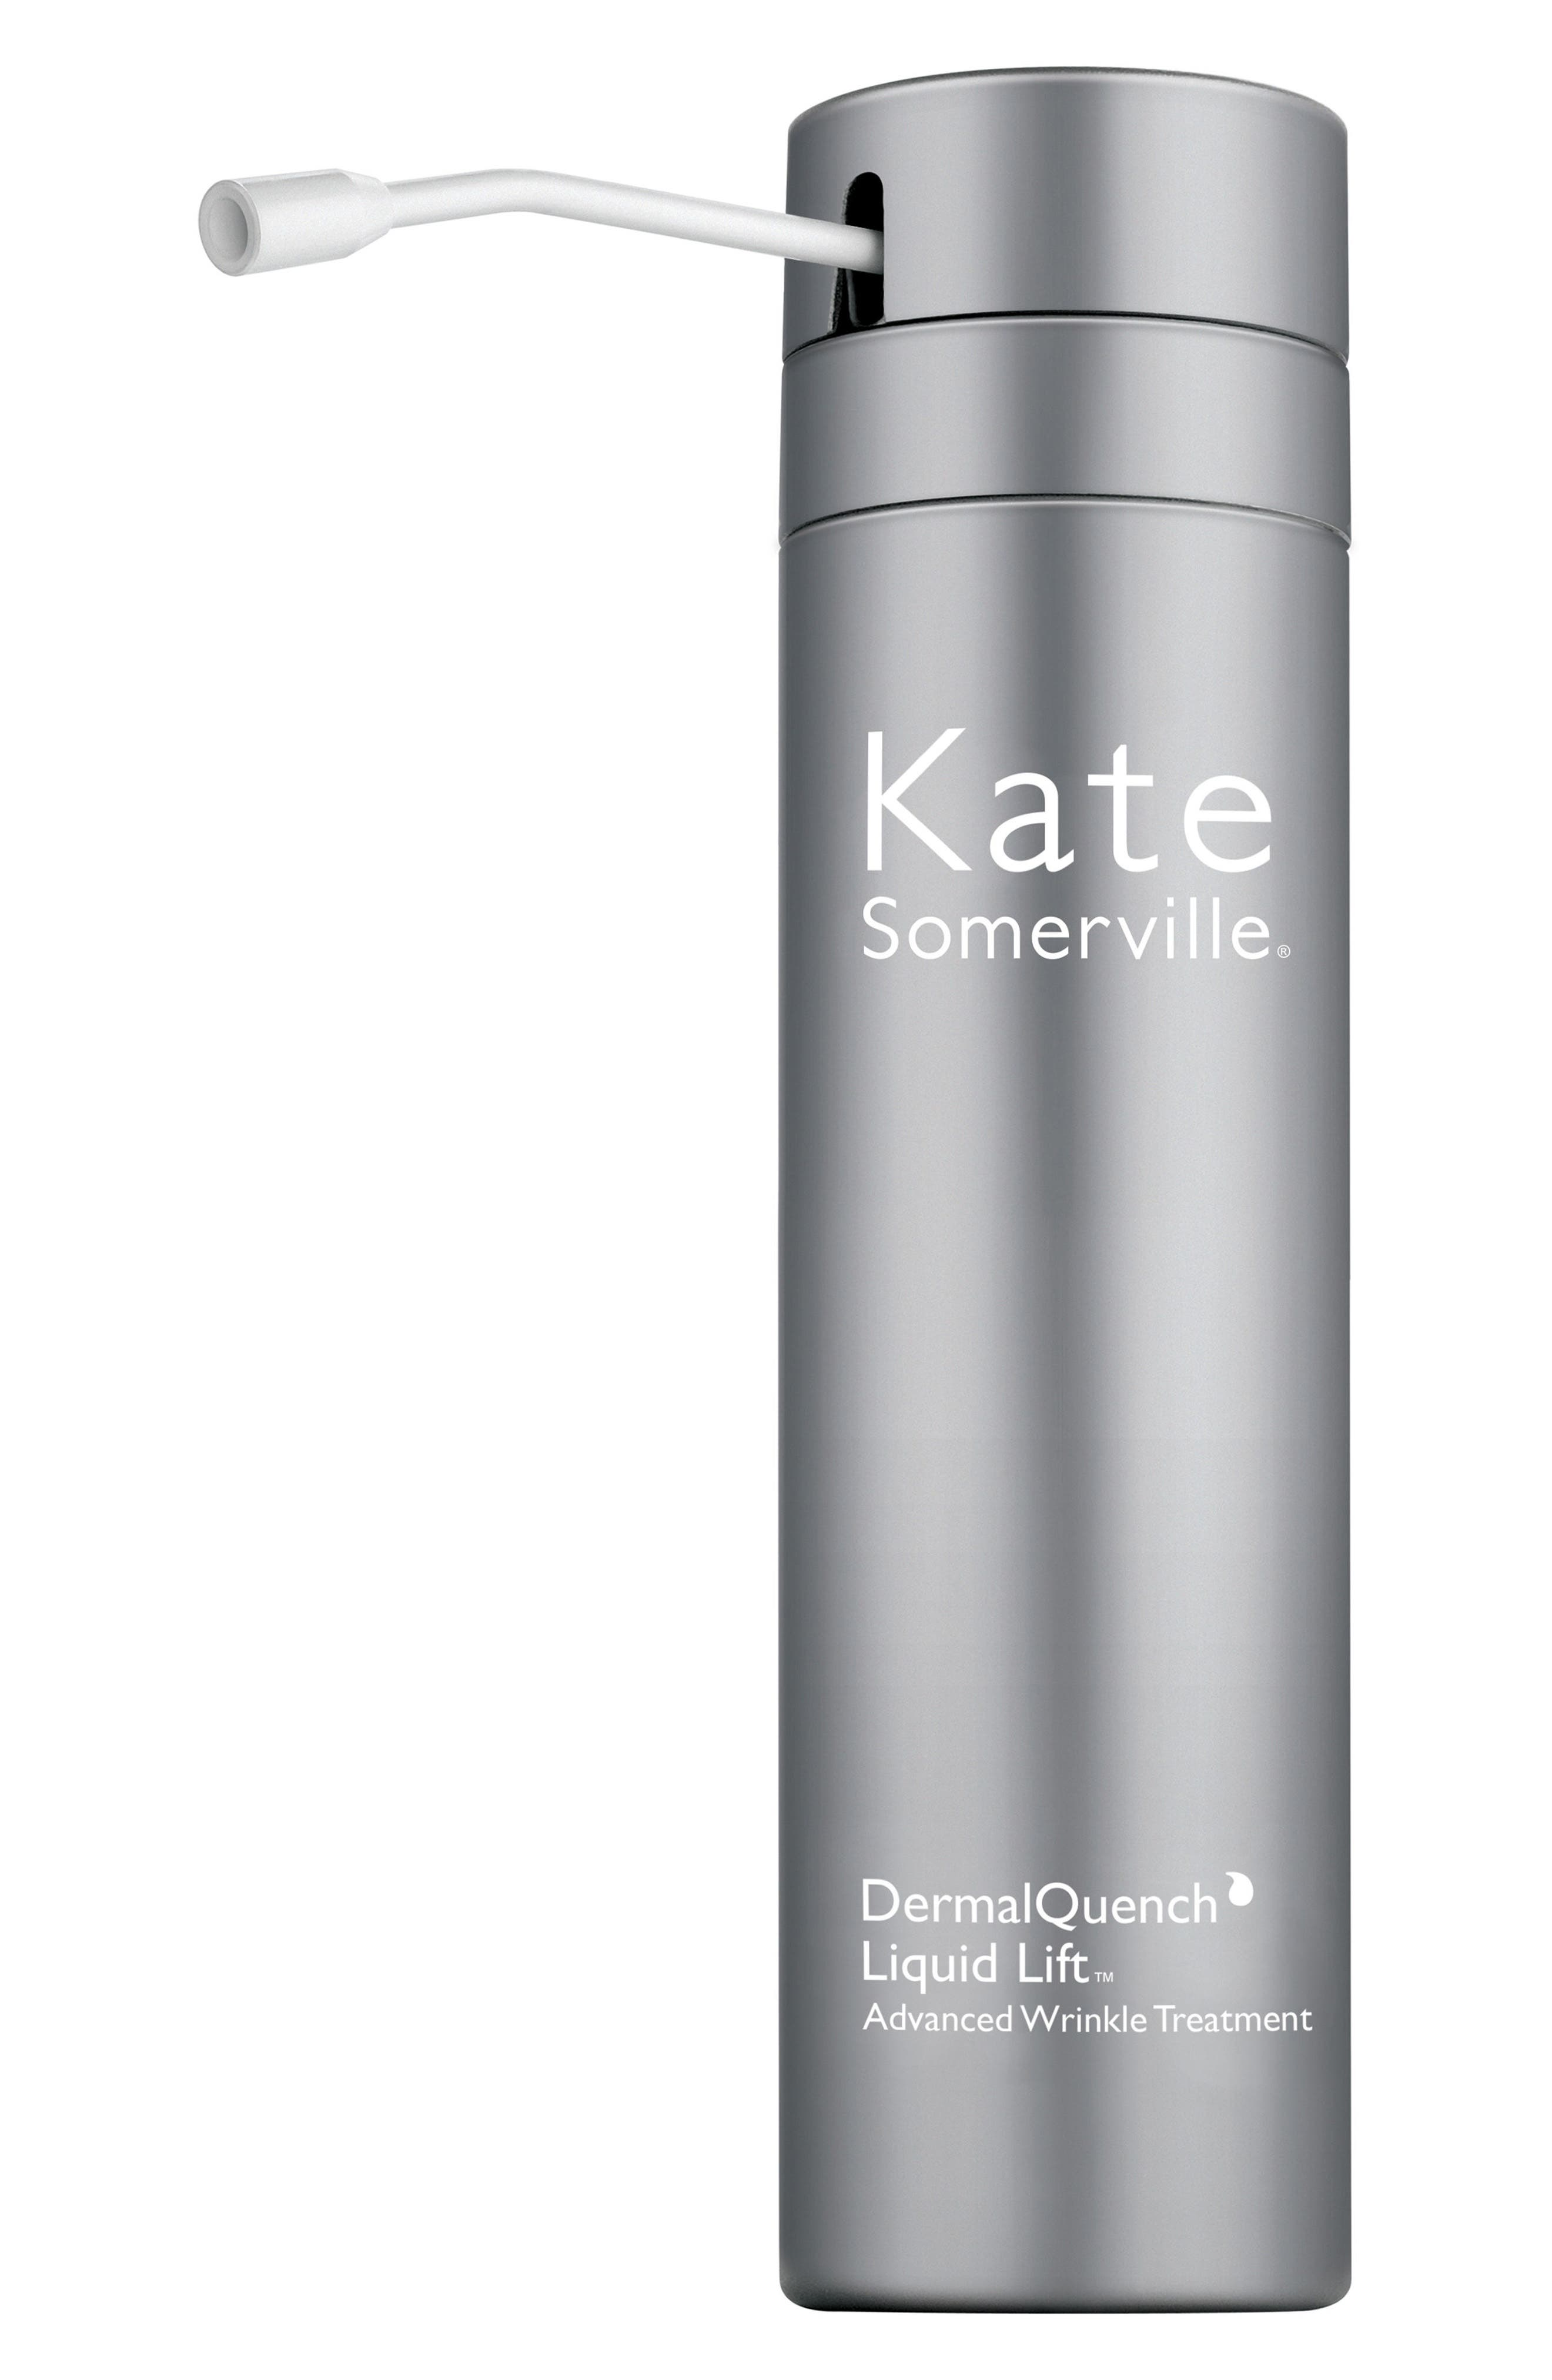 Kate Somerville® DermalQuench Liquid Lift™ Advanced Wrinkle Treatment